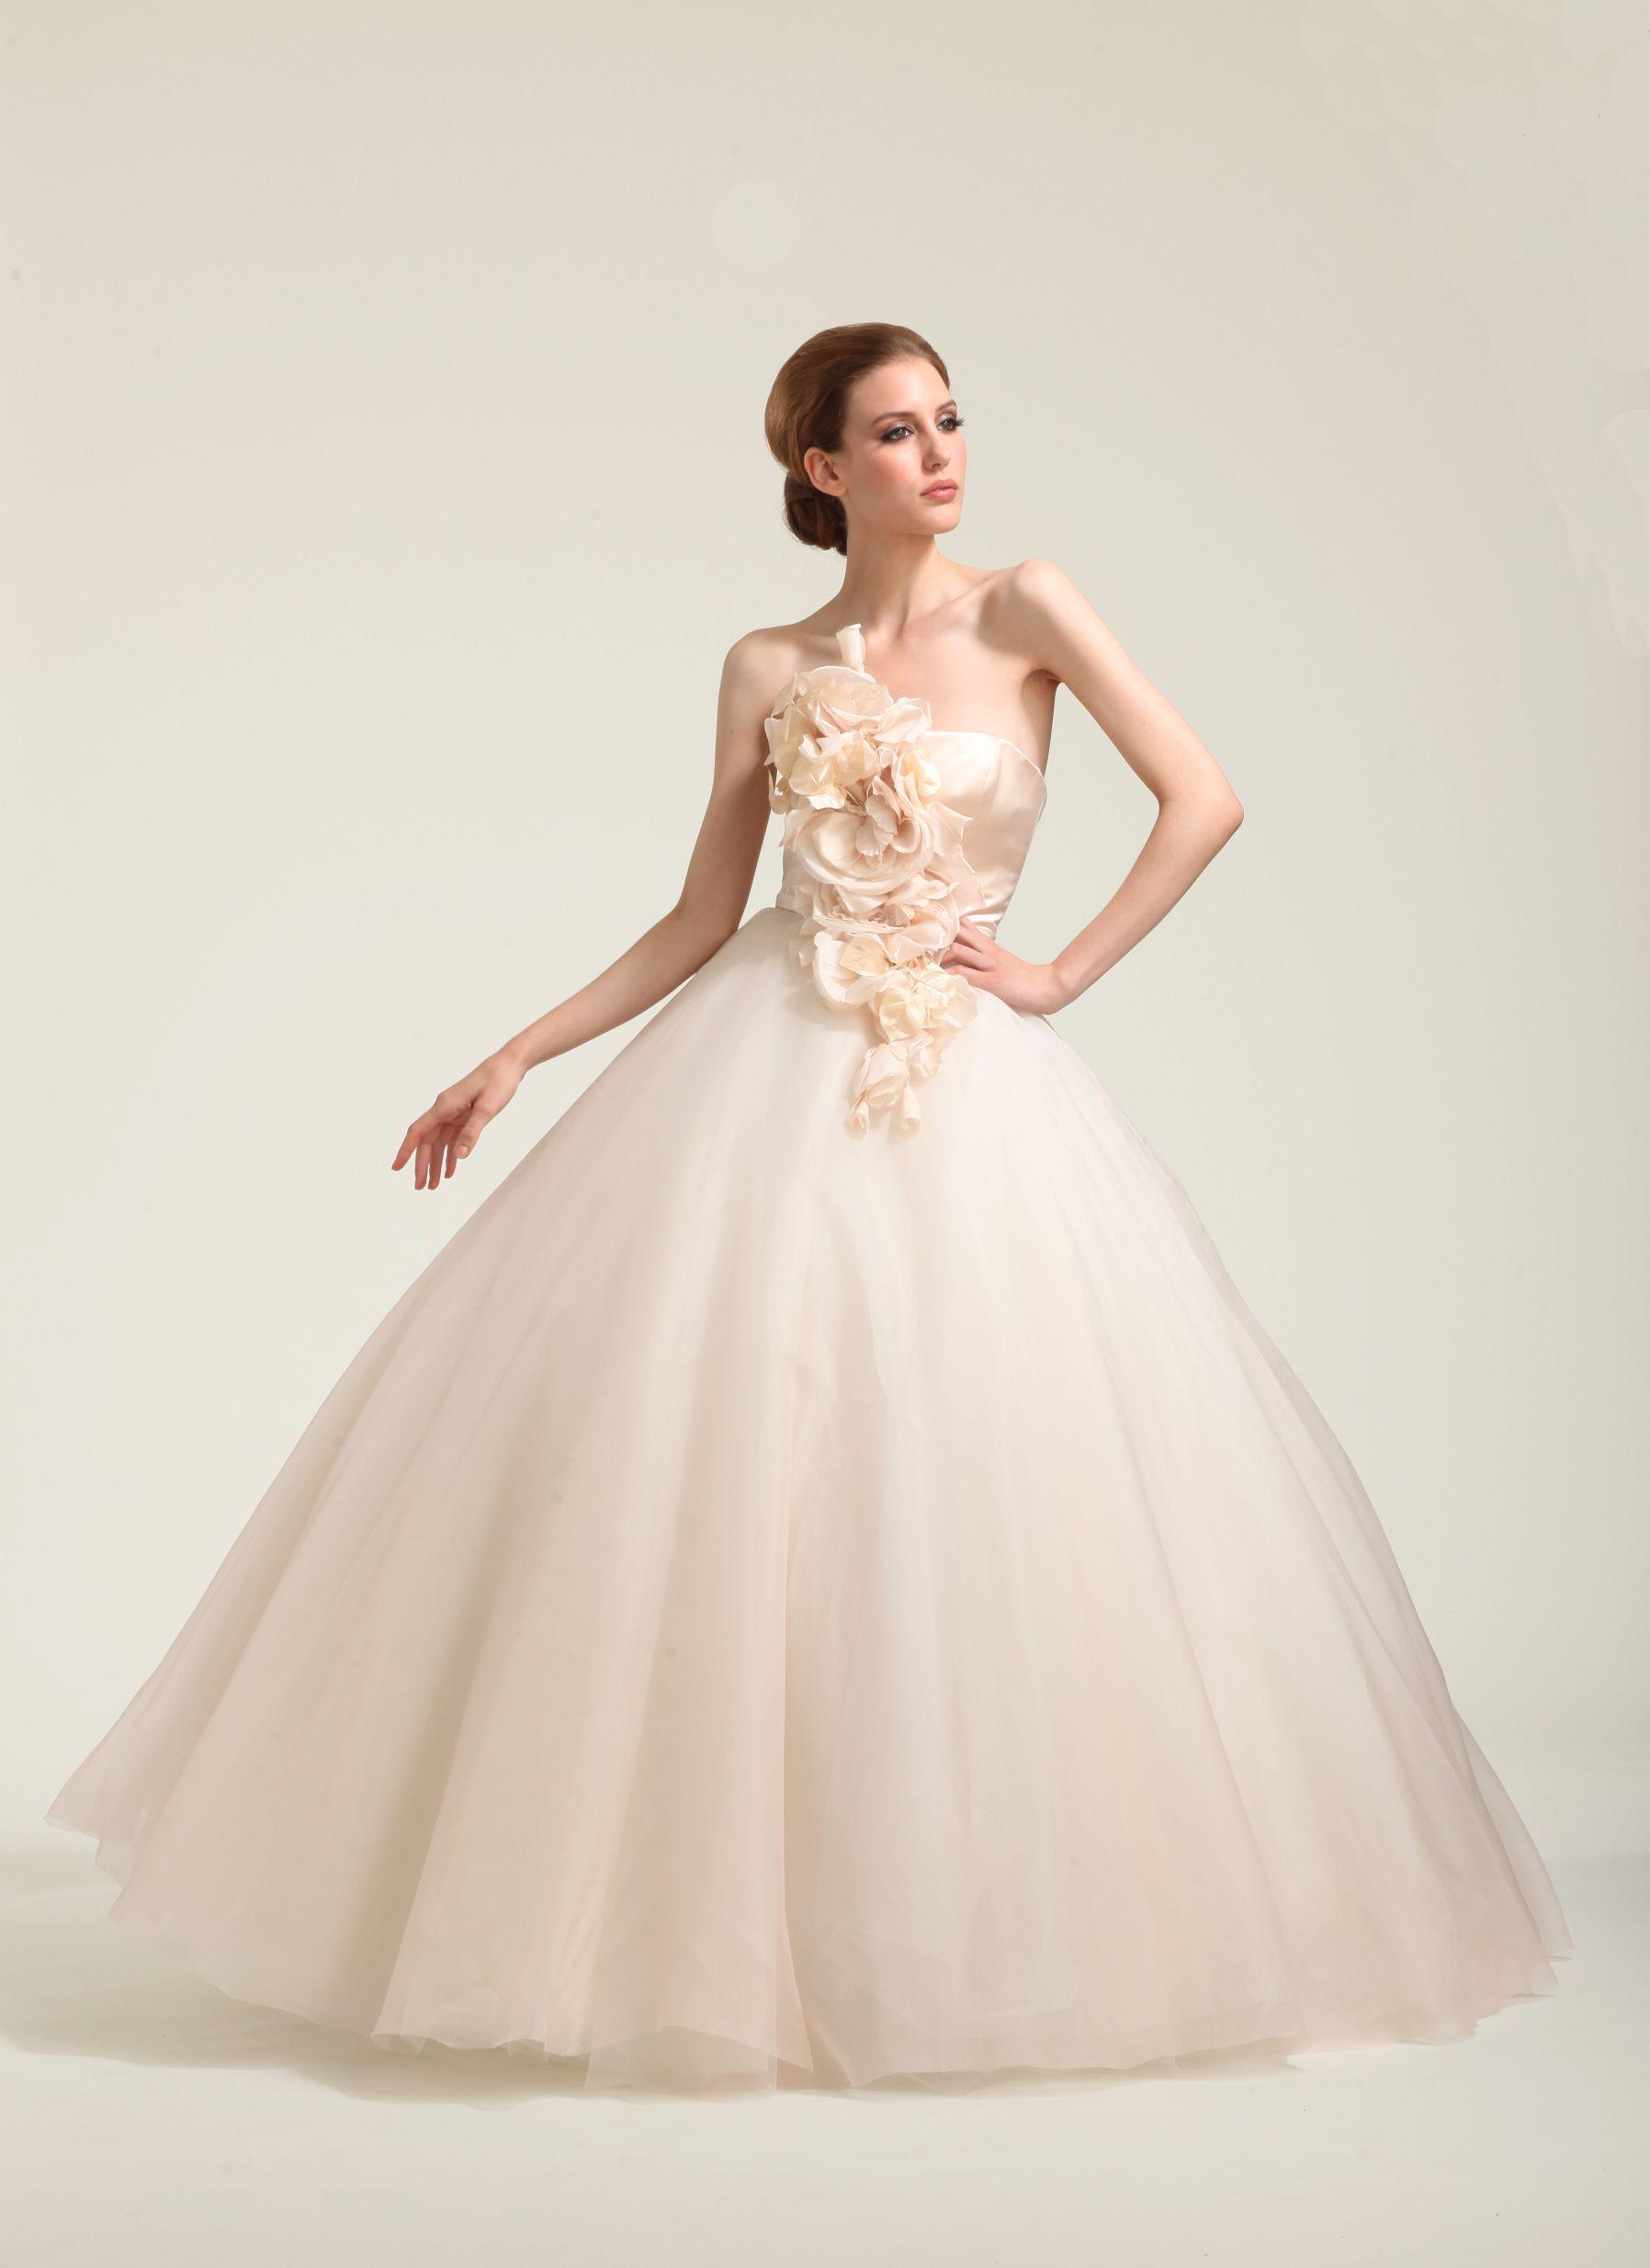 Organza Debutante Britta Kjerkegaard Fashion Wedding Dresses